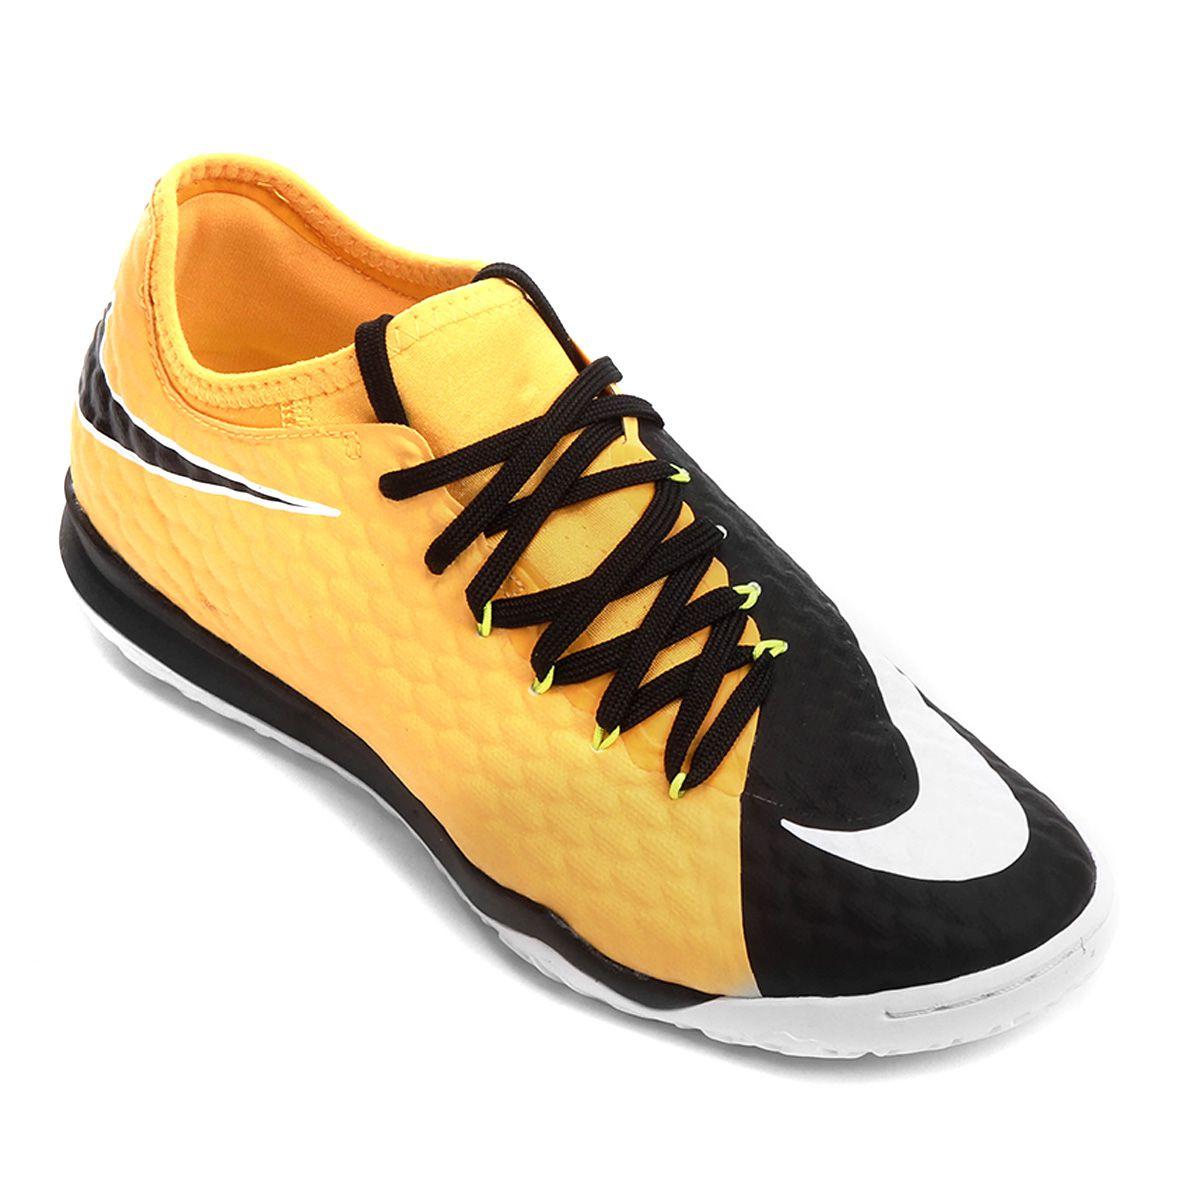 f6b60ab9d4 Chuteira Futsal Nike Hypervenomx Finale Ii Ic - BRACIA SHOP  Loja de ...